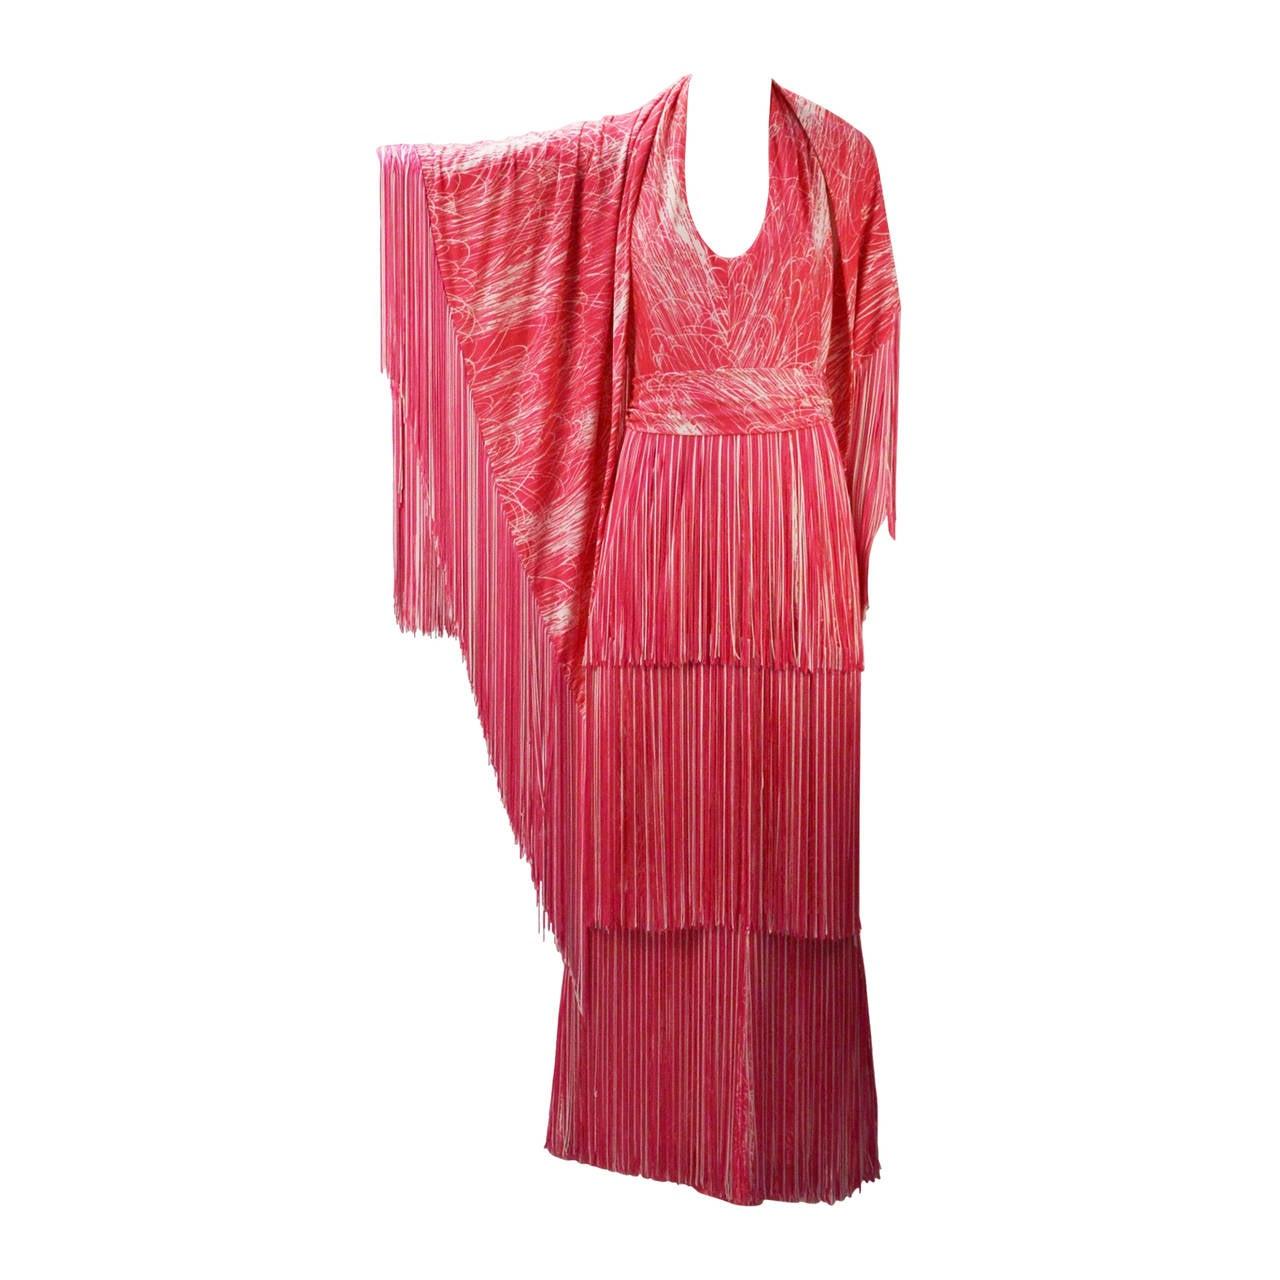 1970s Lilli Diamond Pink and White Fringe Halter Dress and Shawl